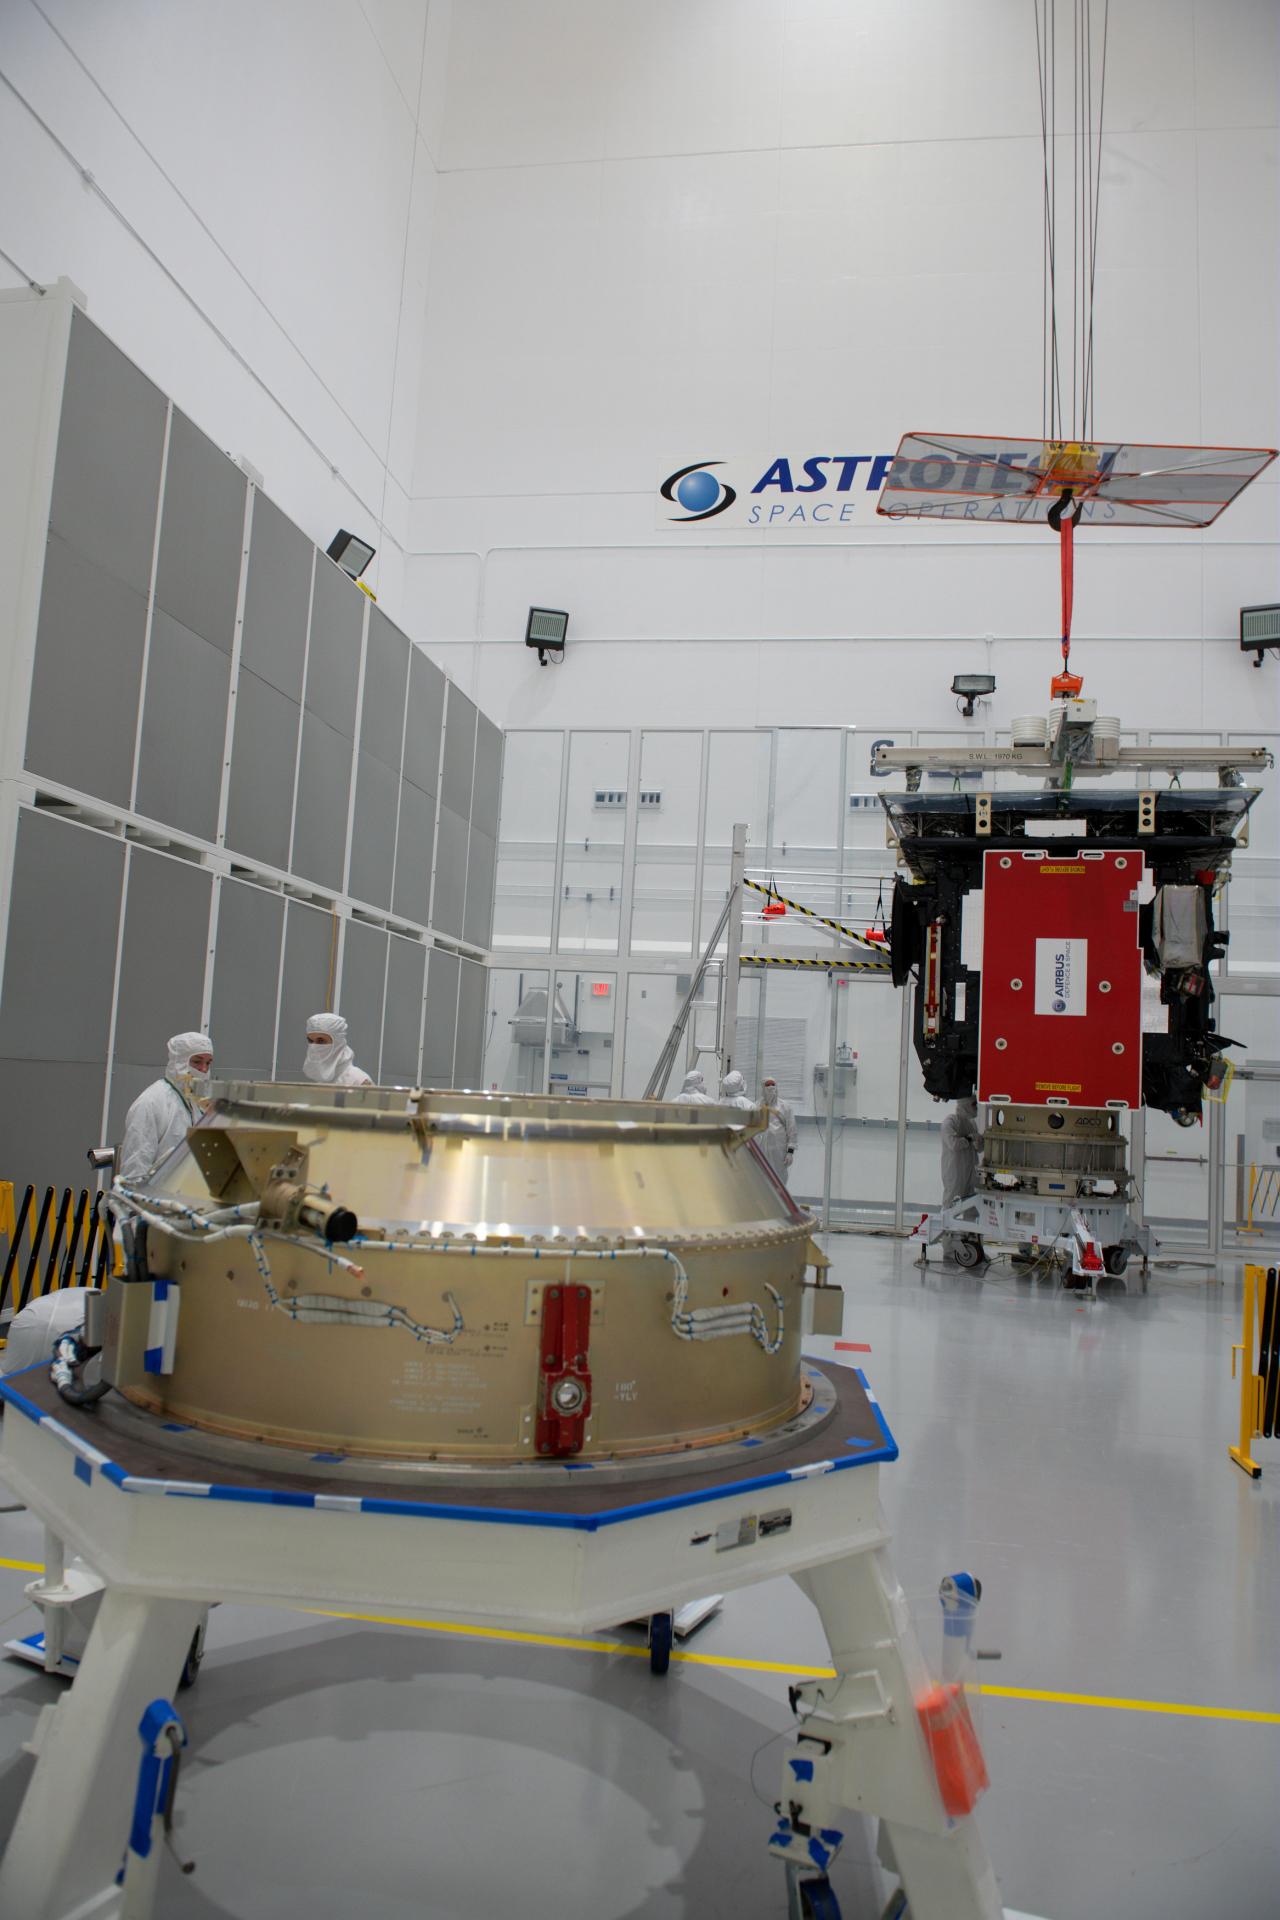 Solar_Orbiter_during_launch_preparations_1_1280.jpg